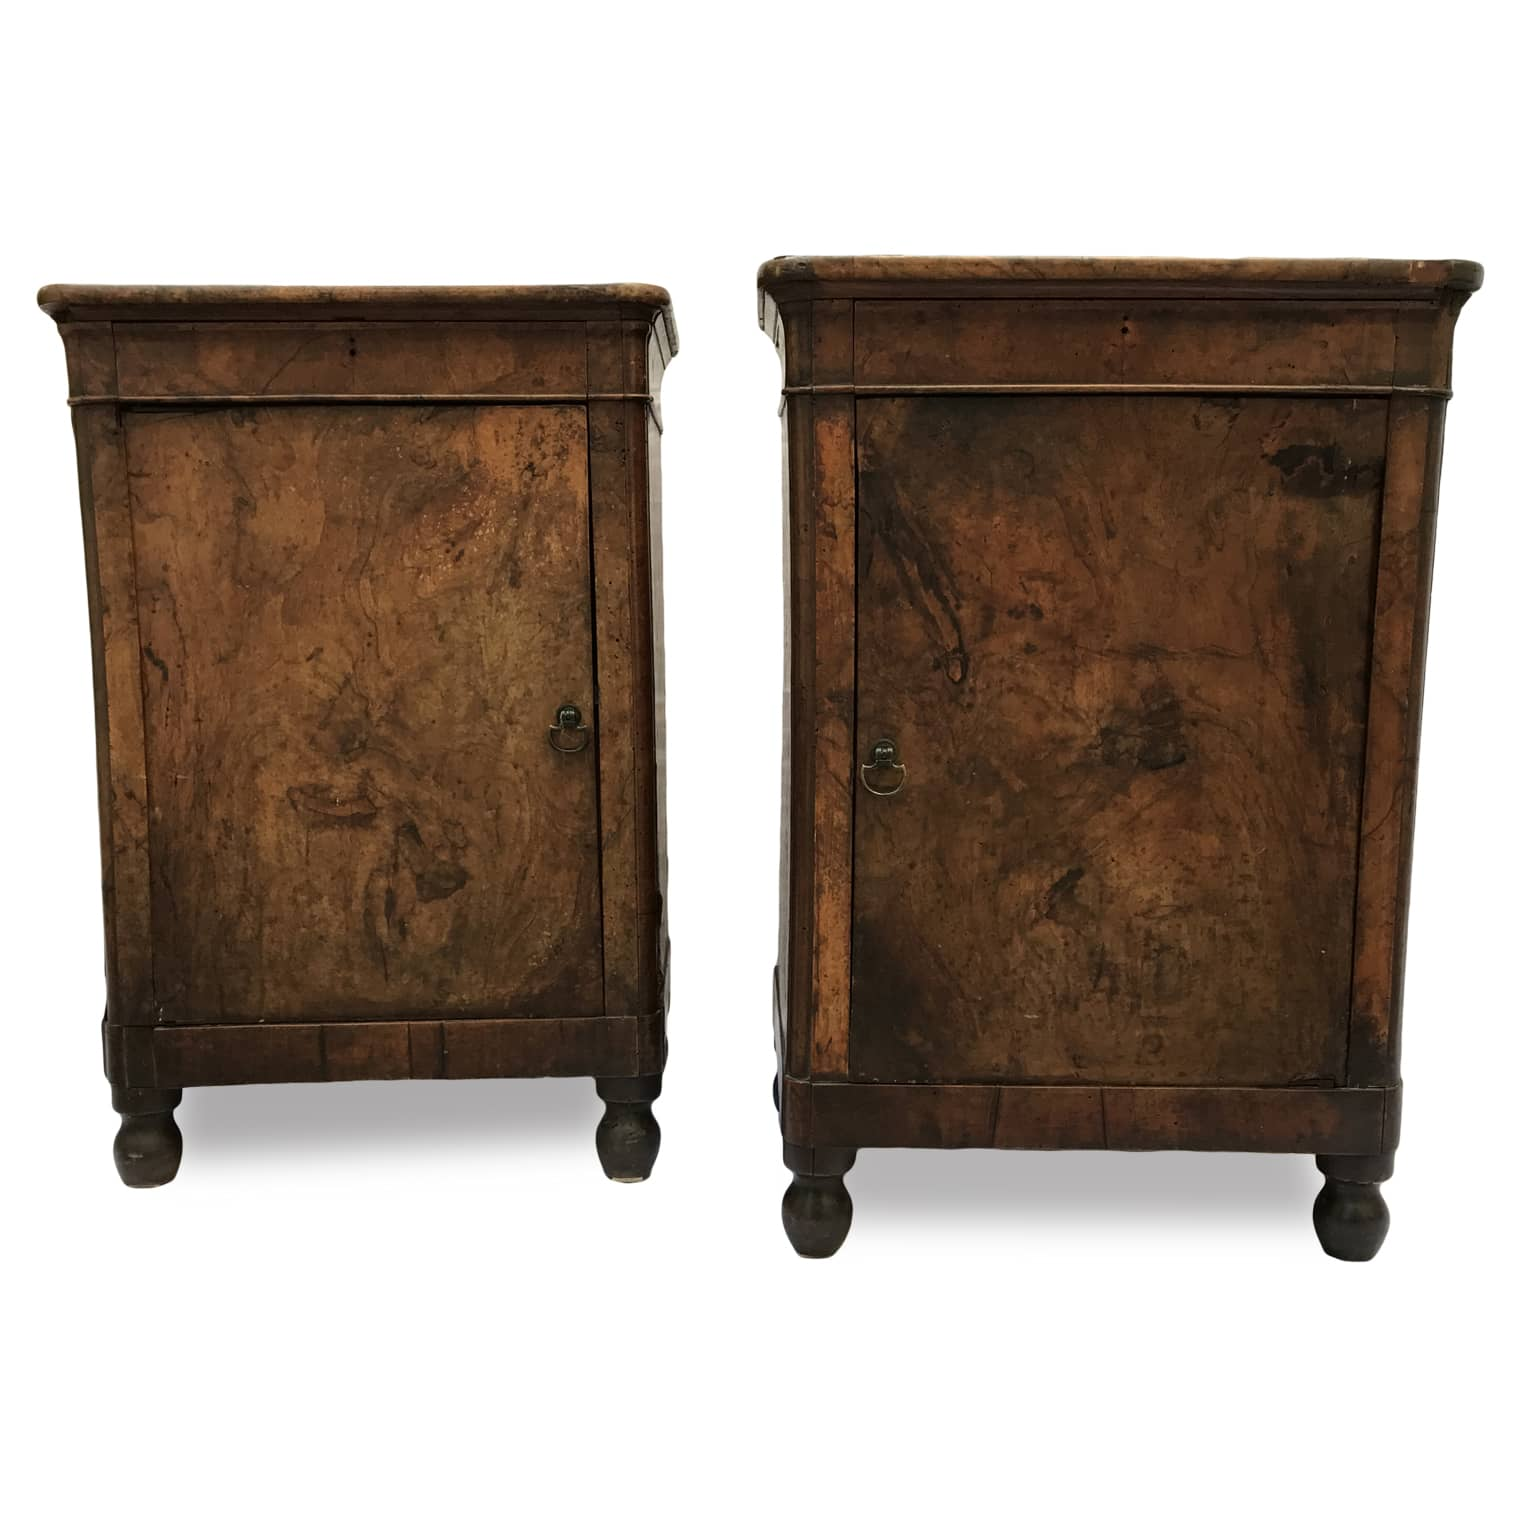 Stunning mobili antichi milano contemporary - Mobili antichi milano ...